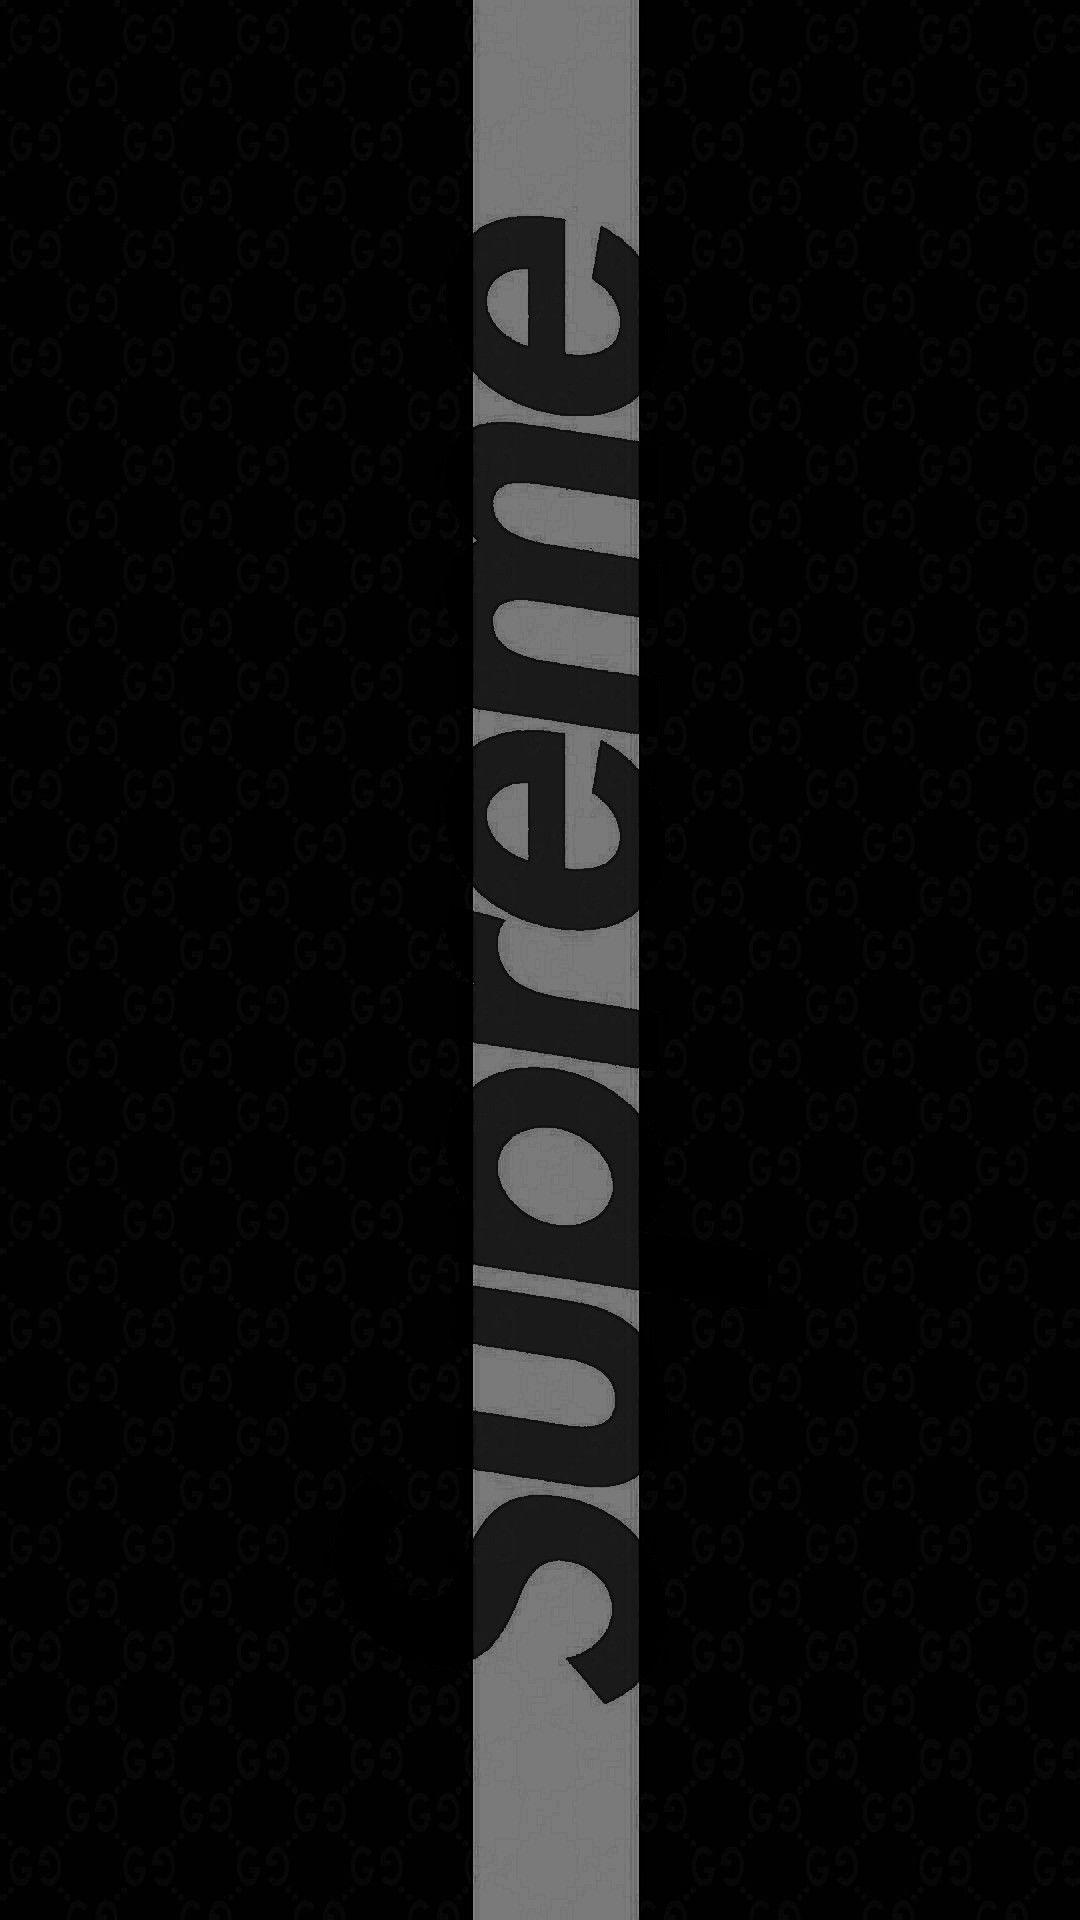 Supreme Black iPhone Wallpapers - Wallpaper Cave